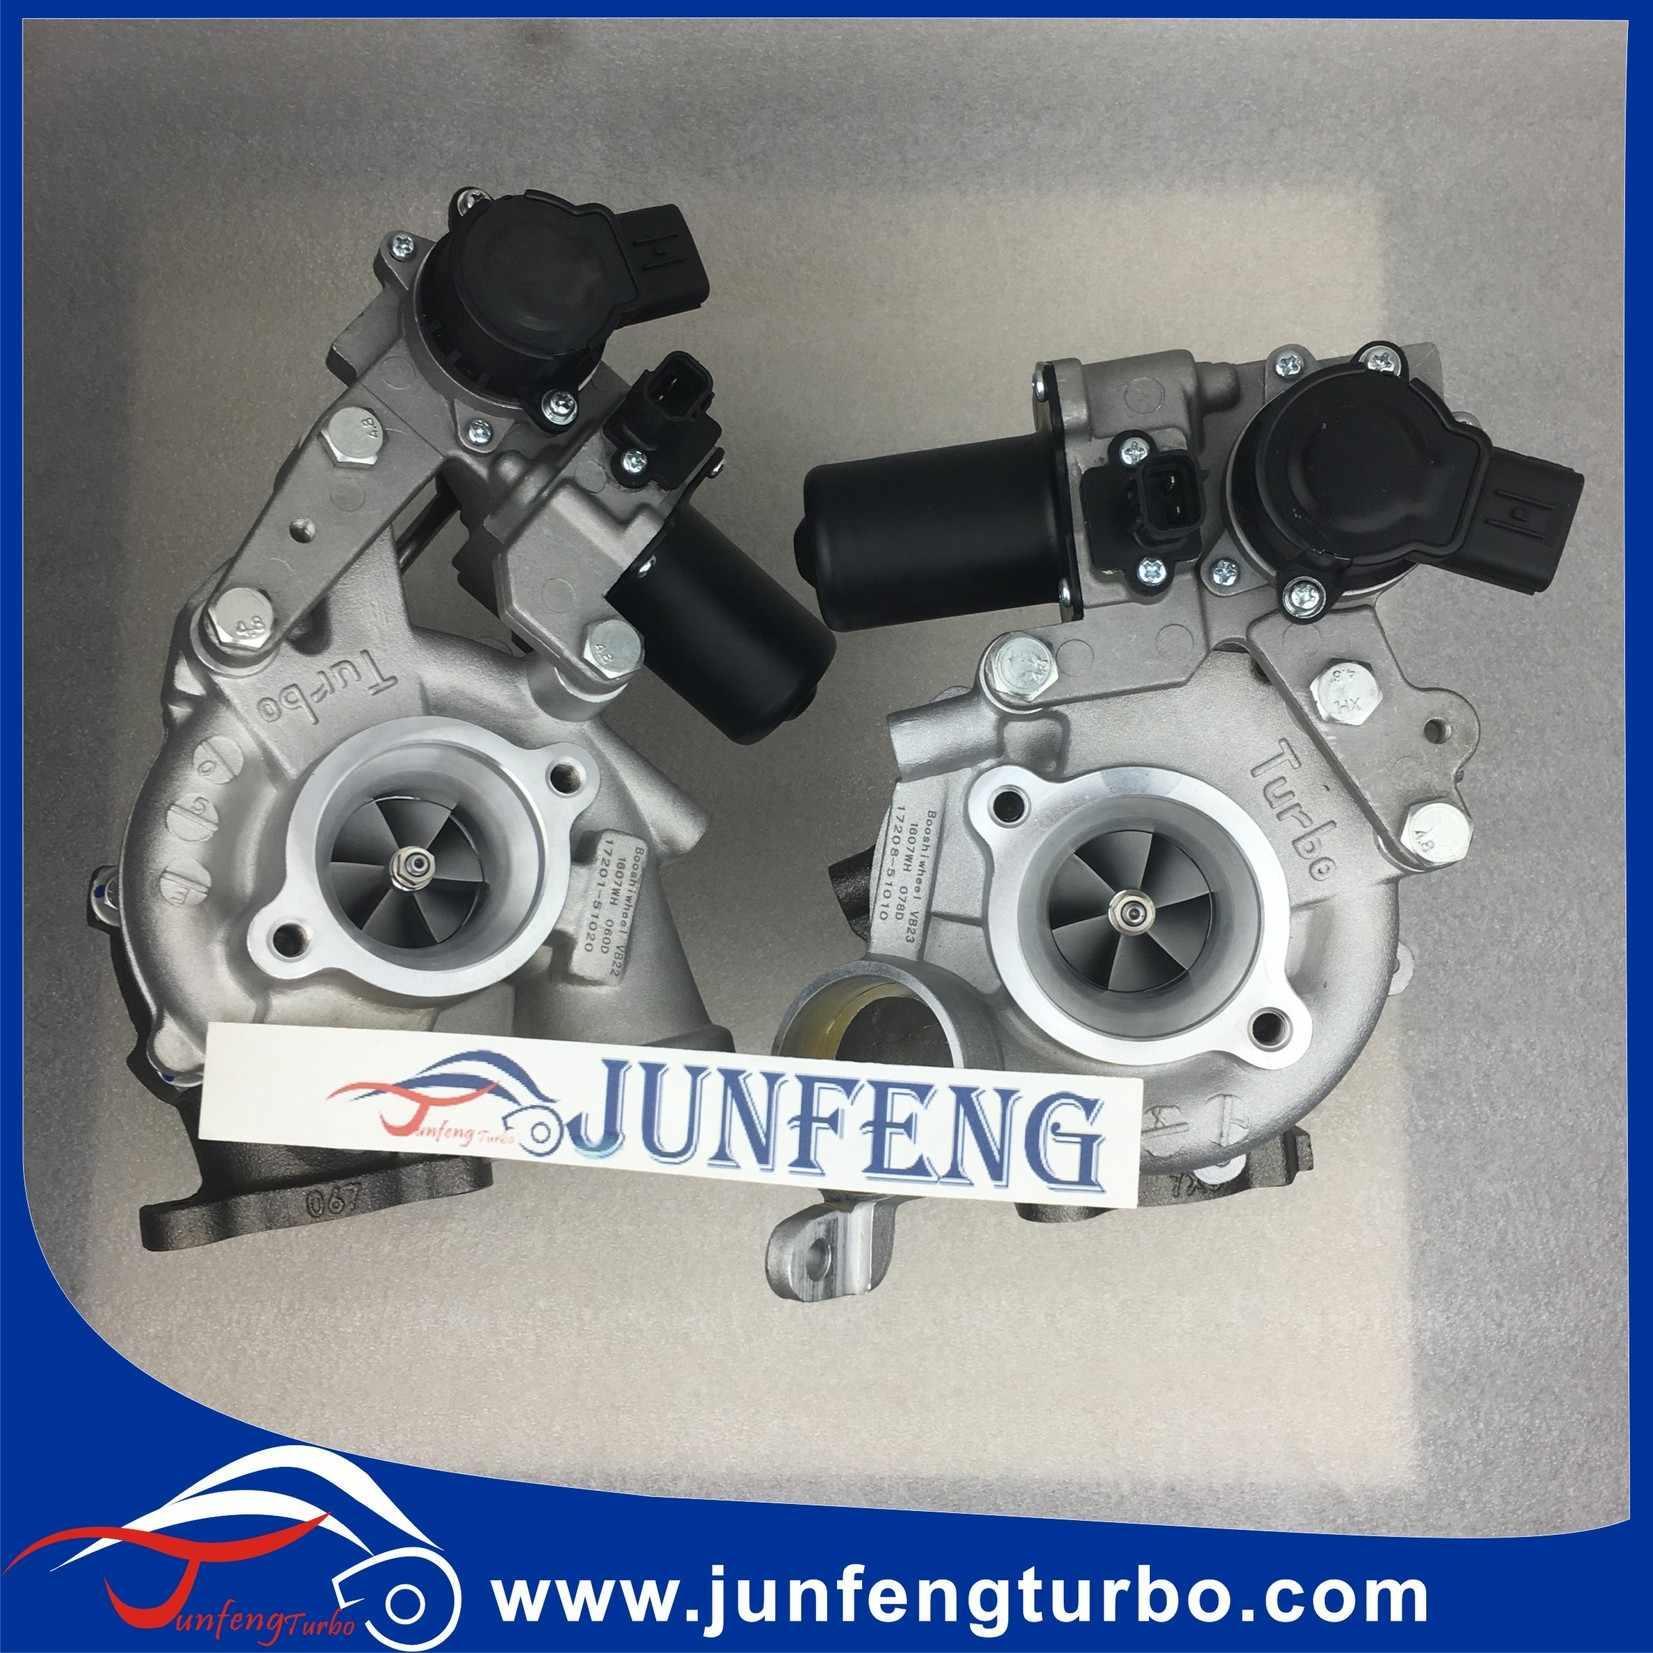 RHV4 VB23 Turbo 17208-51010 17201-78032 with 1VD turbocharger